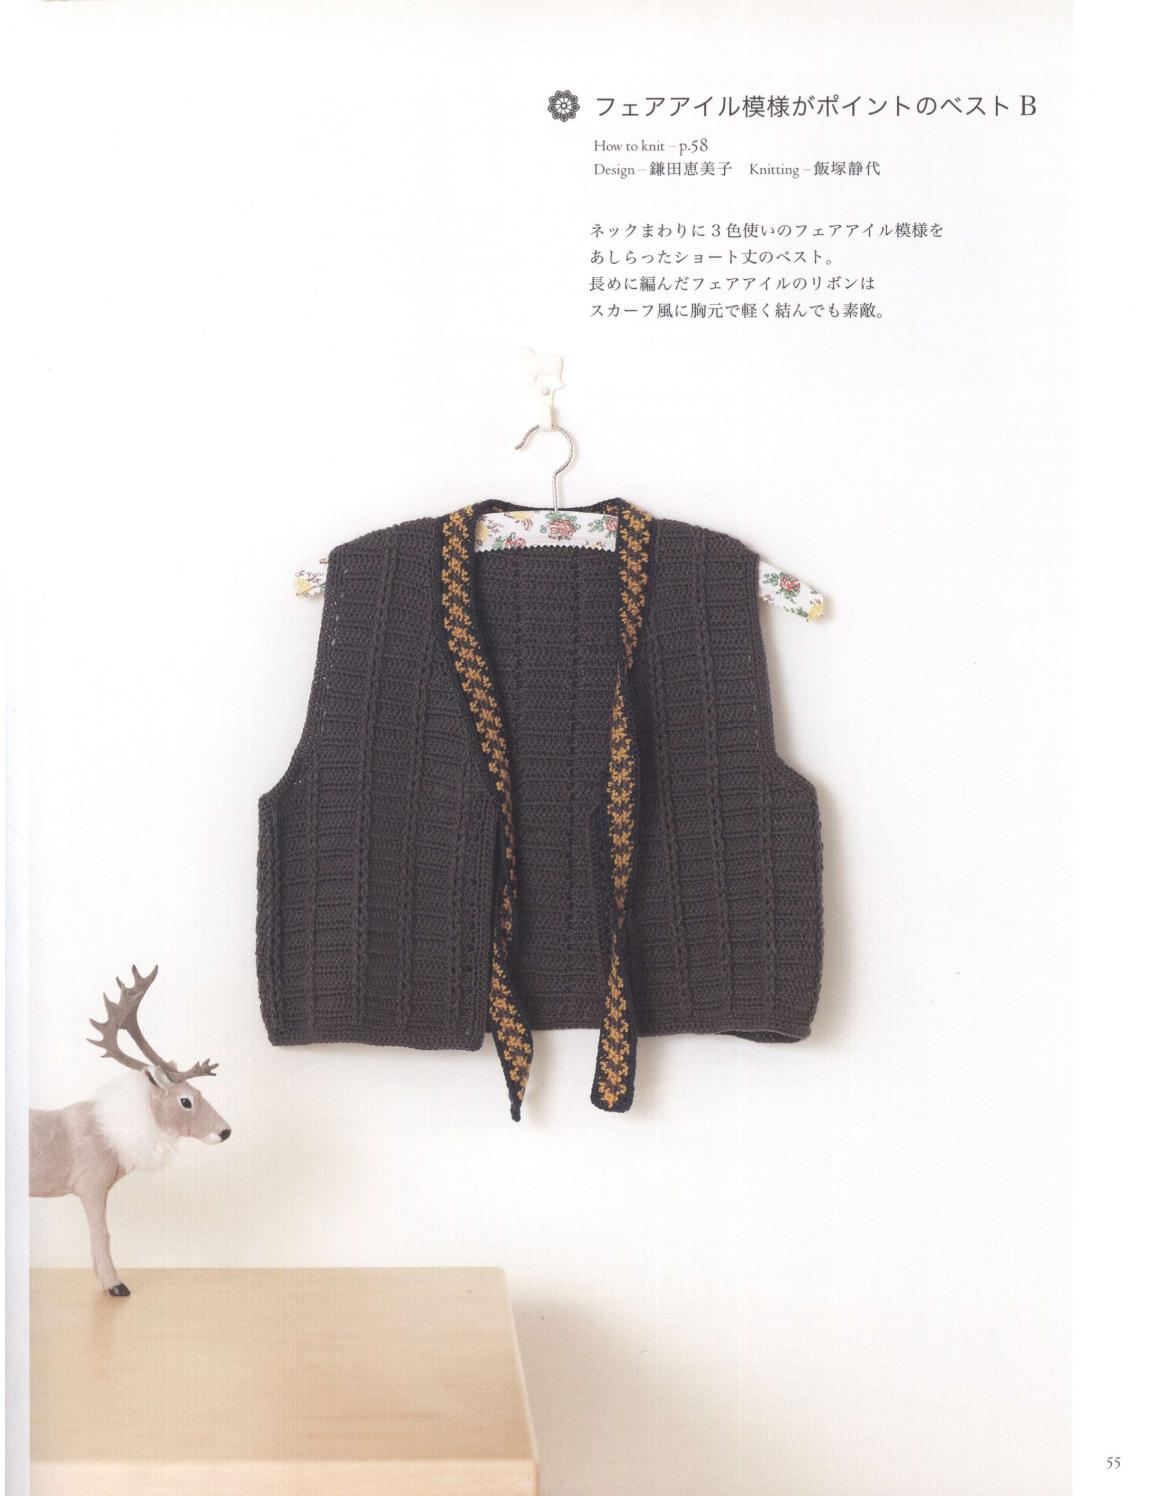 Asahi original crochet best selection 2012 page 55